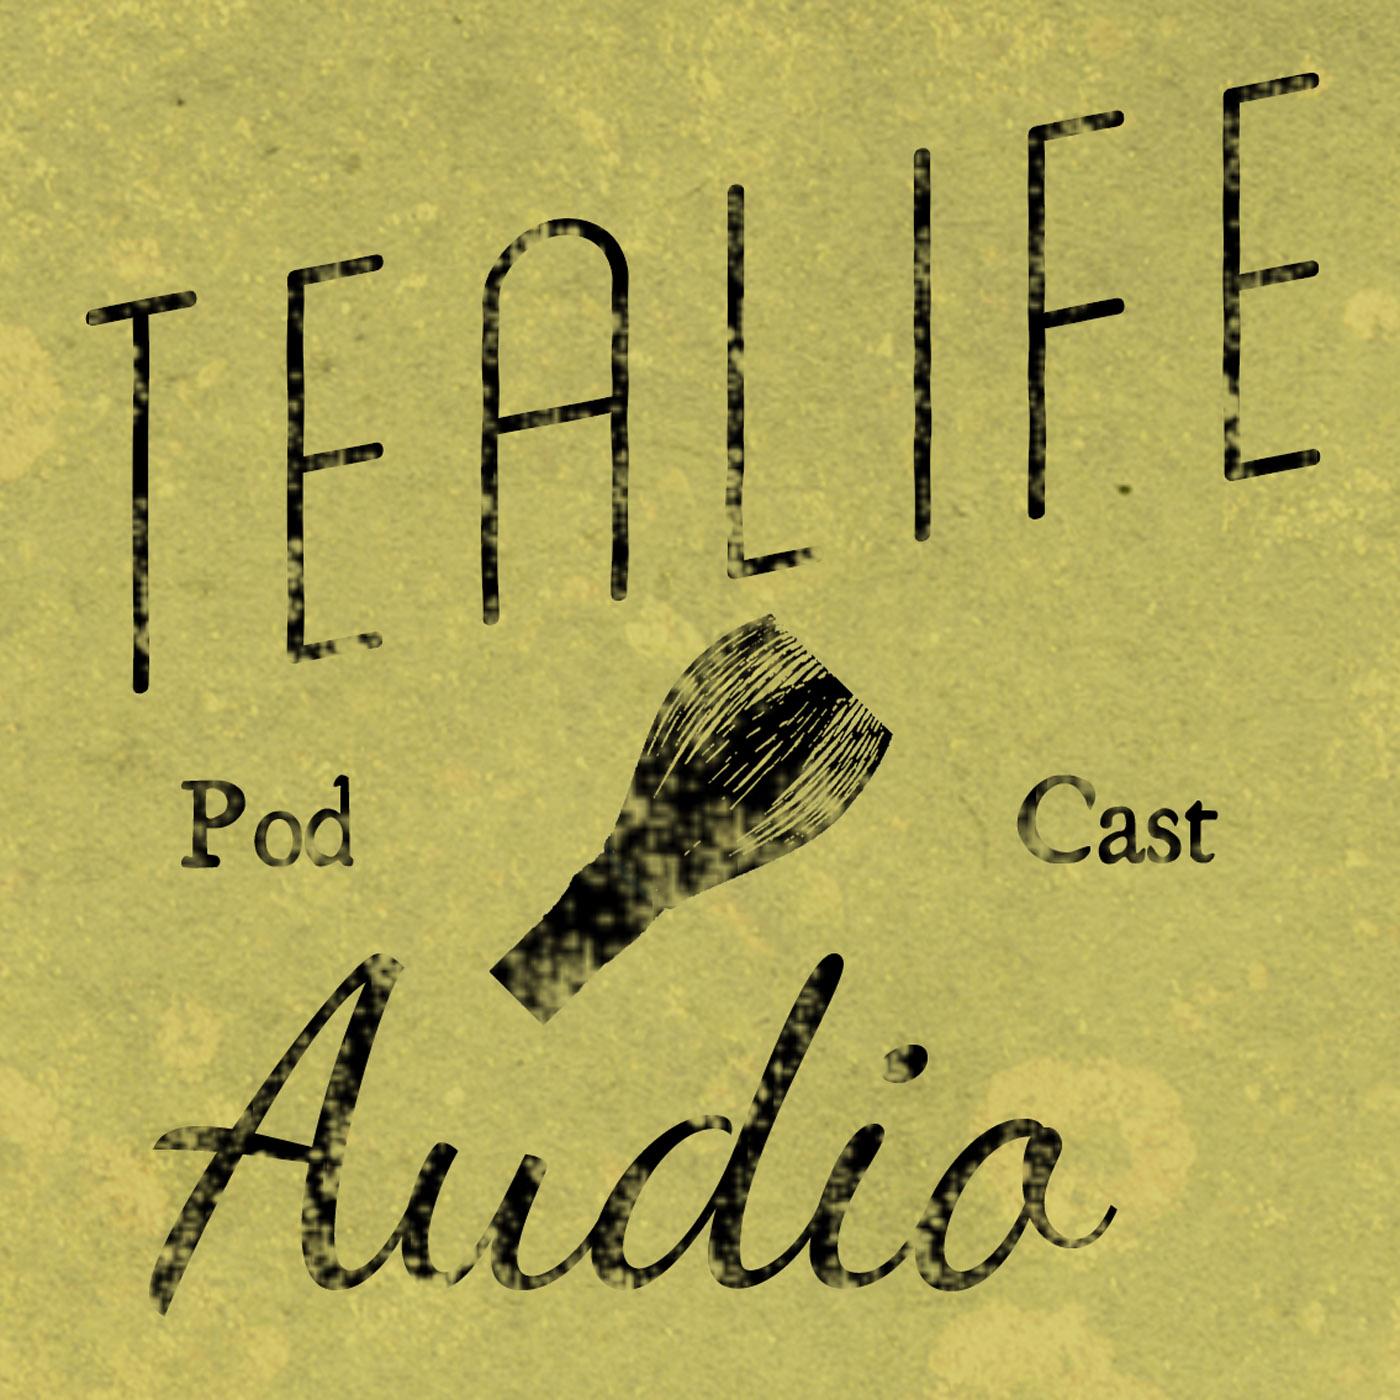 TeaLife Audio - Chado the Japanese Way of Tea show art